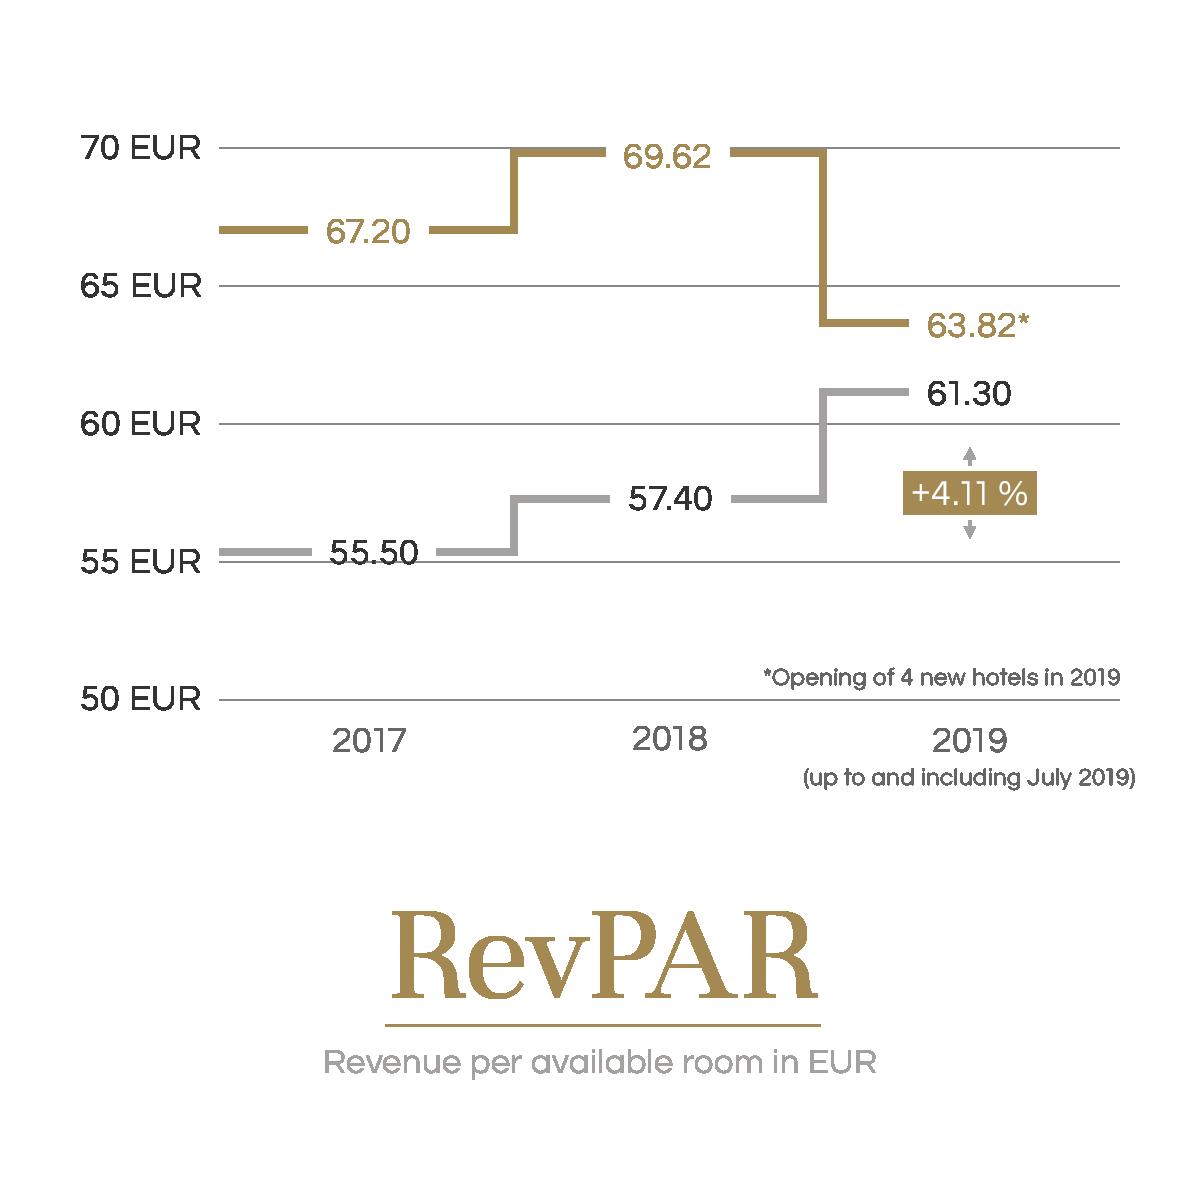 Revenue per available room in EUR